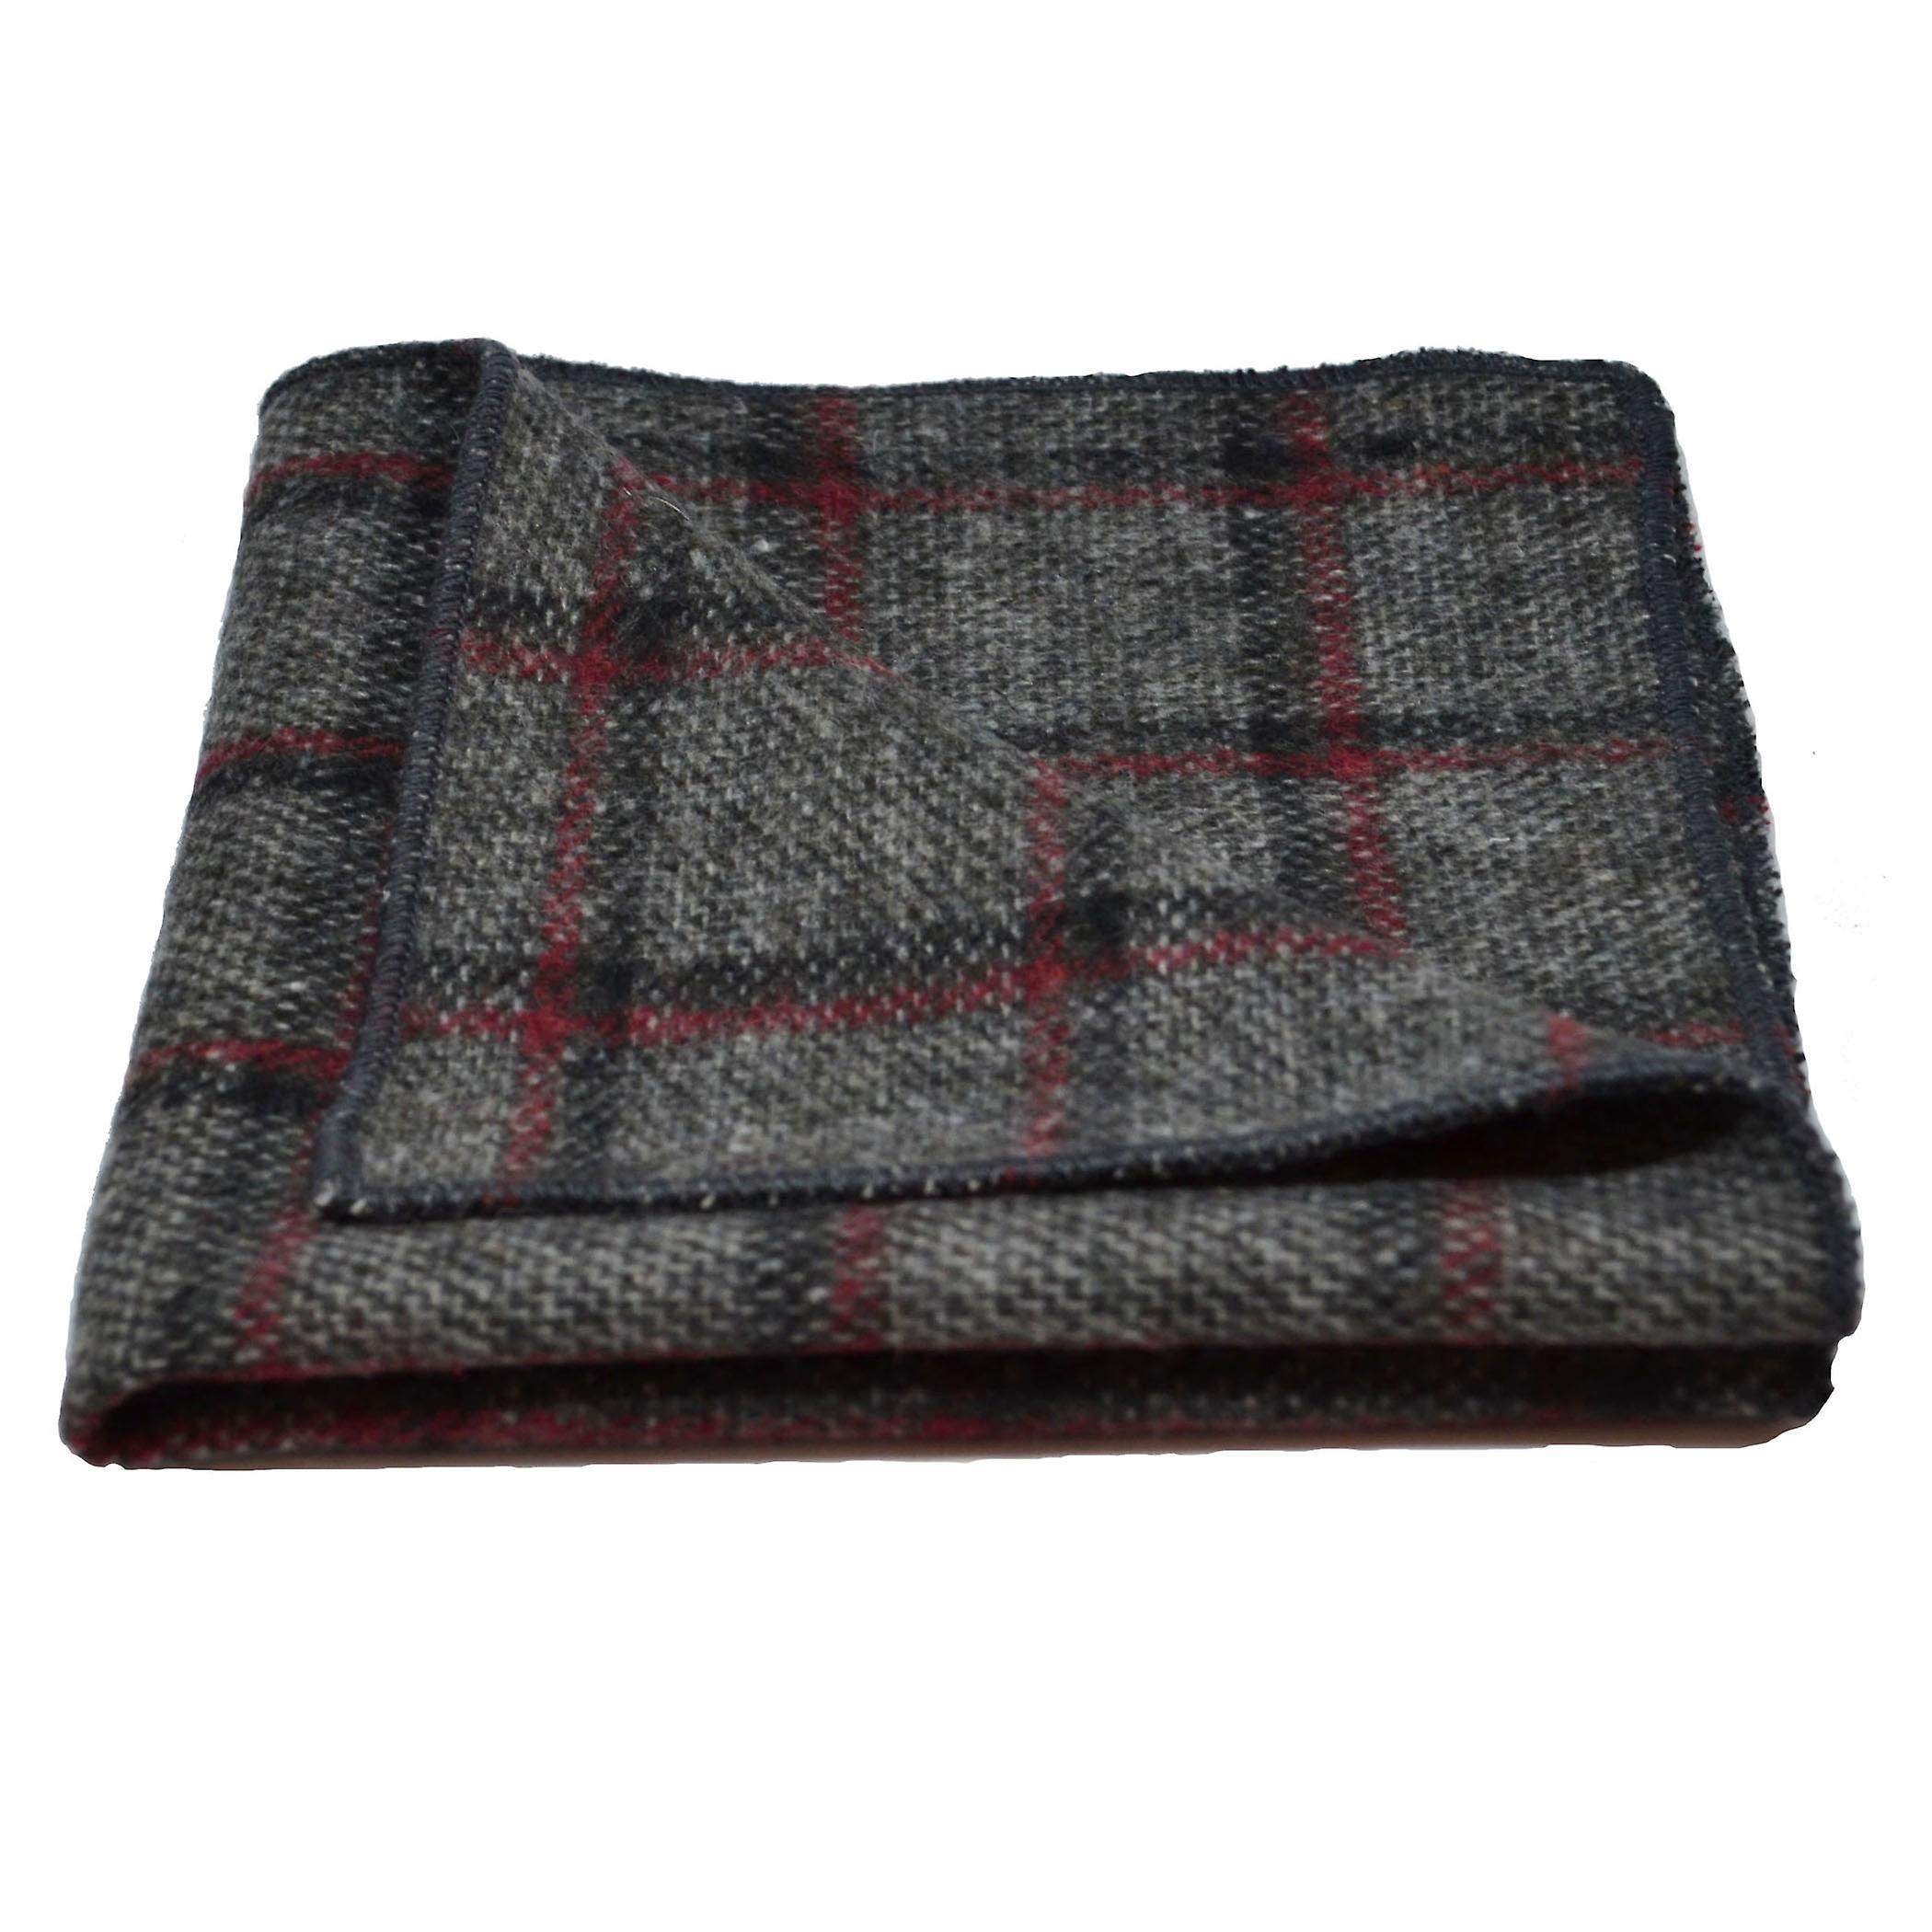 Heritage Pebble Grey Check Tie & Pocket Square Set